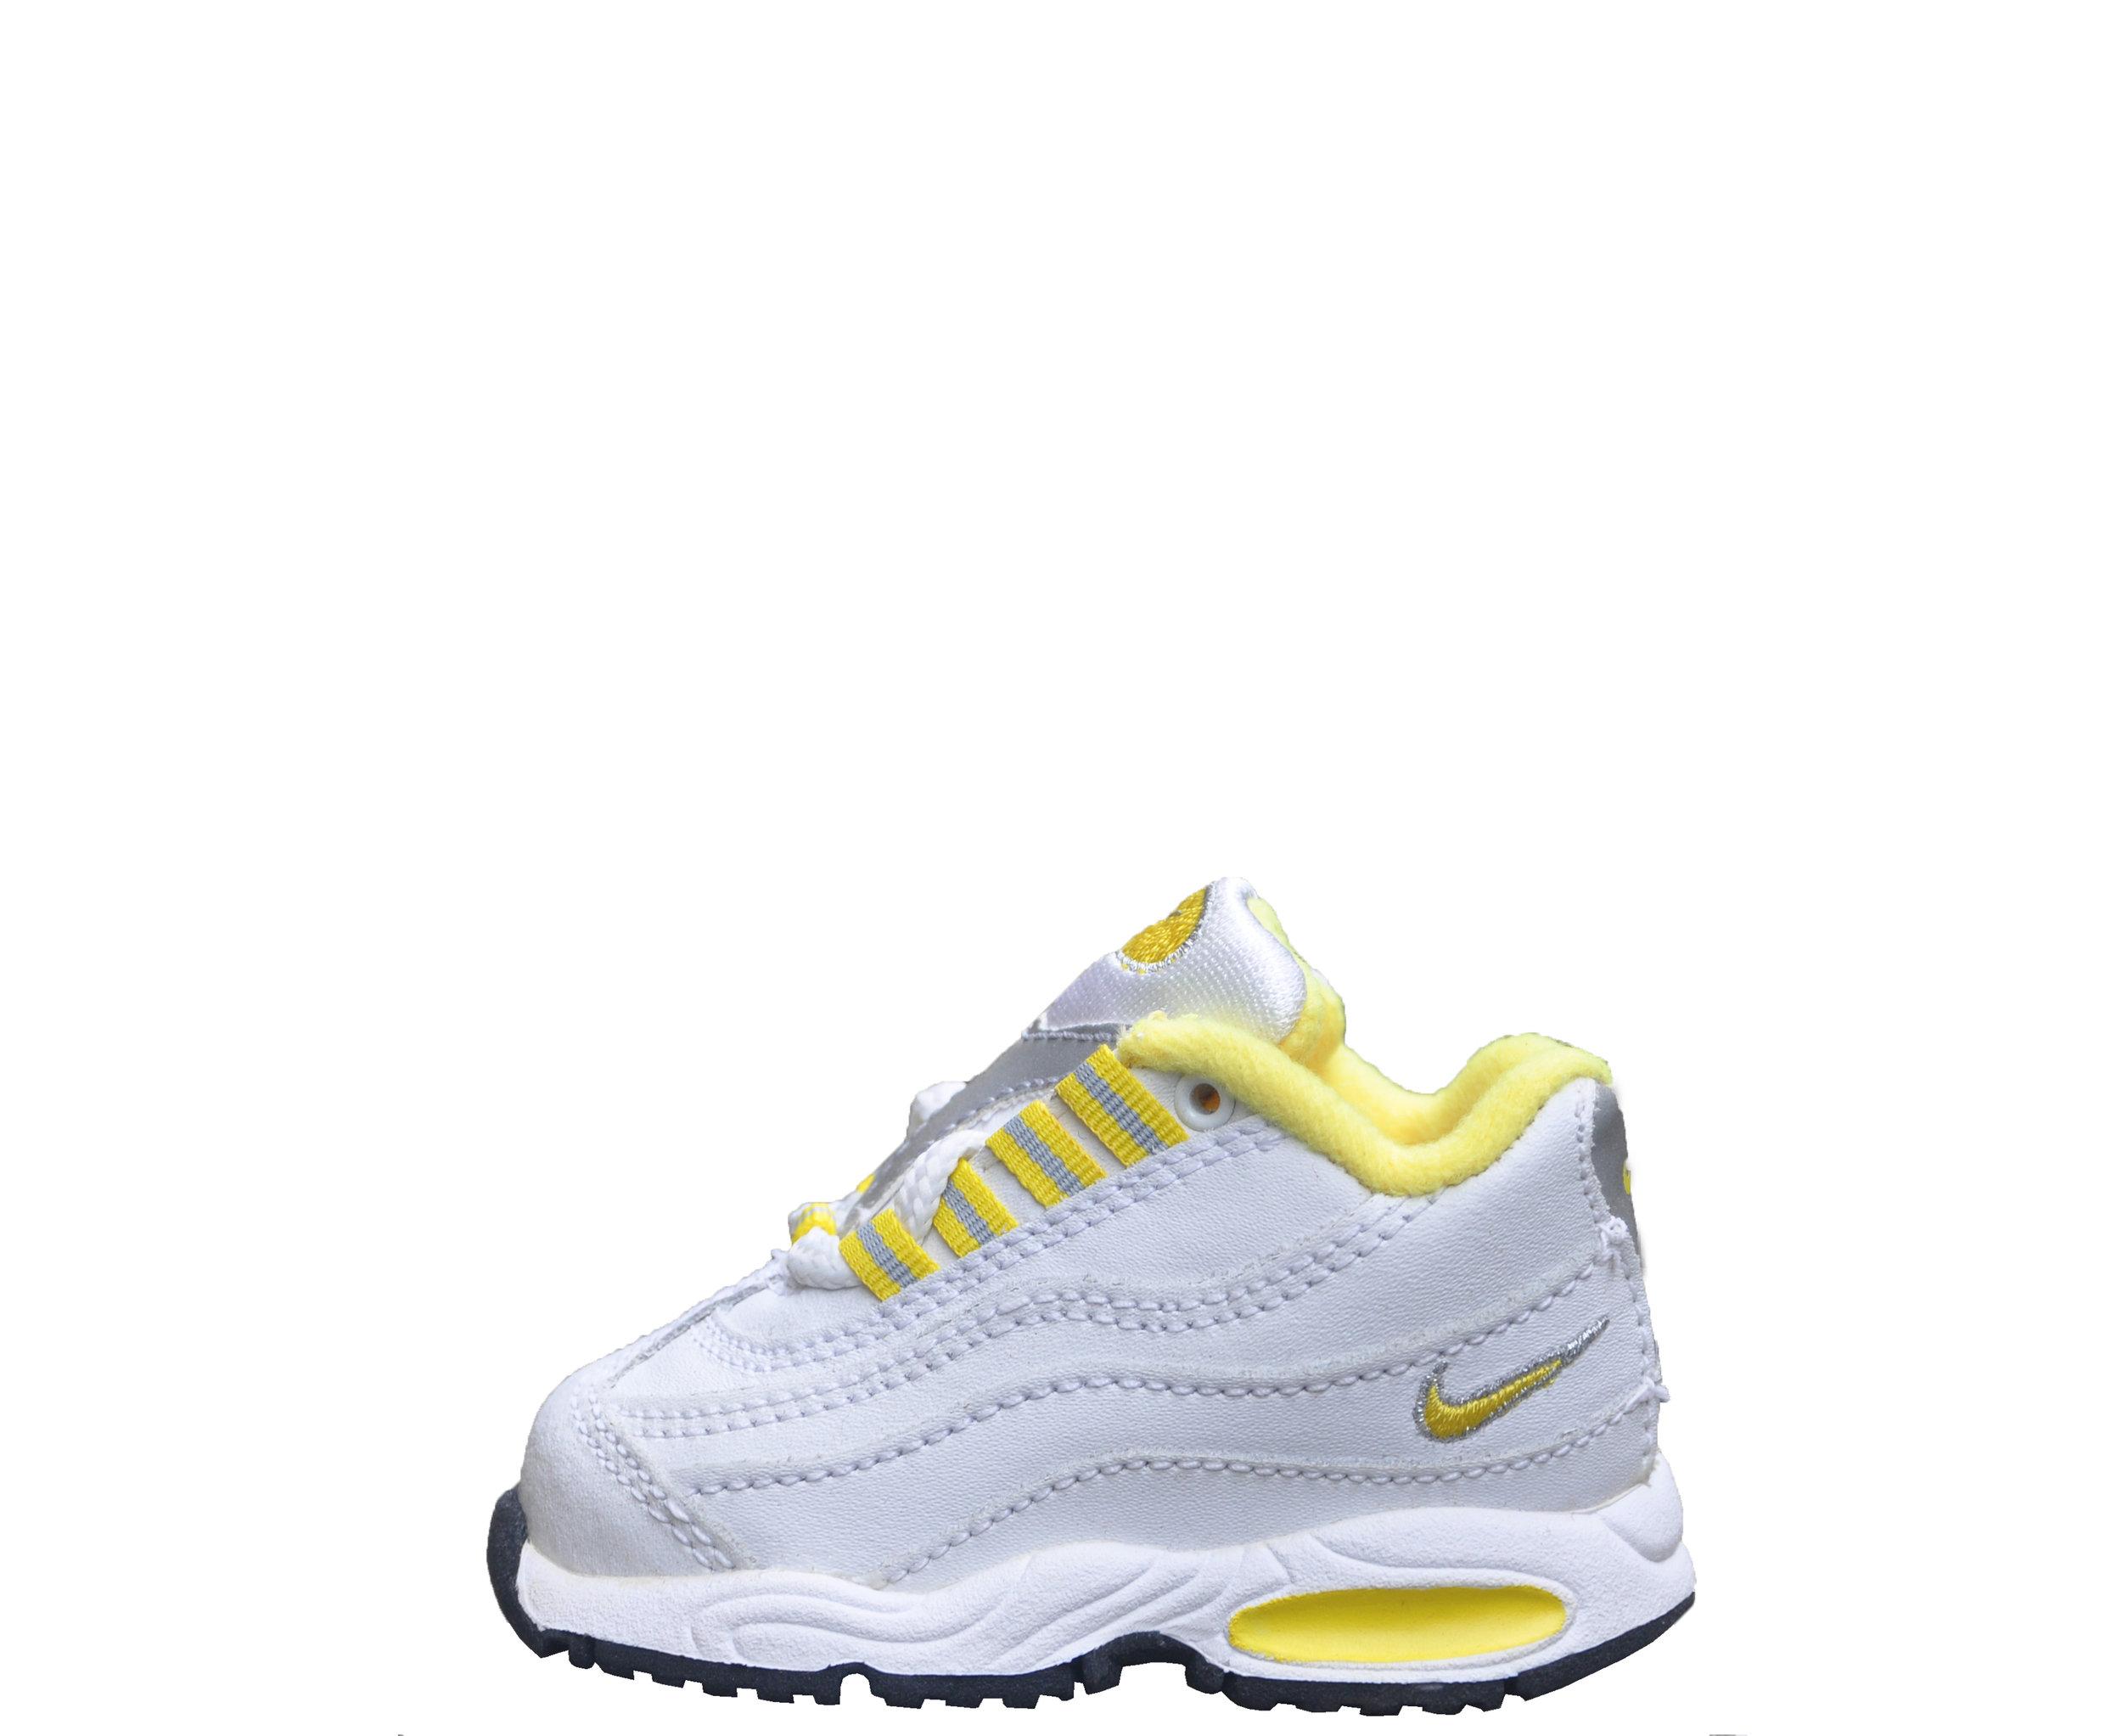 Baby Nike Air Max 95 White / Yellow DS